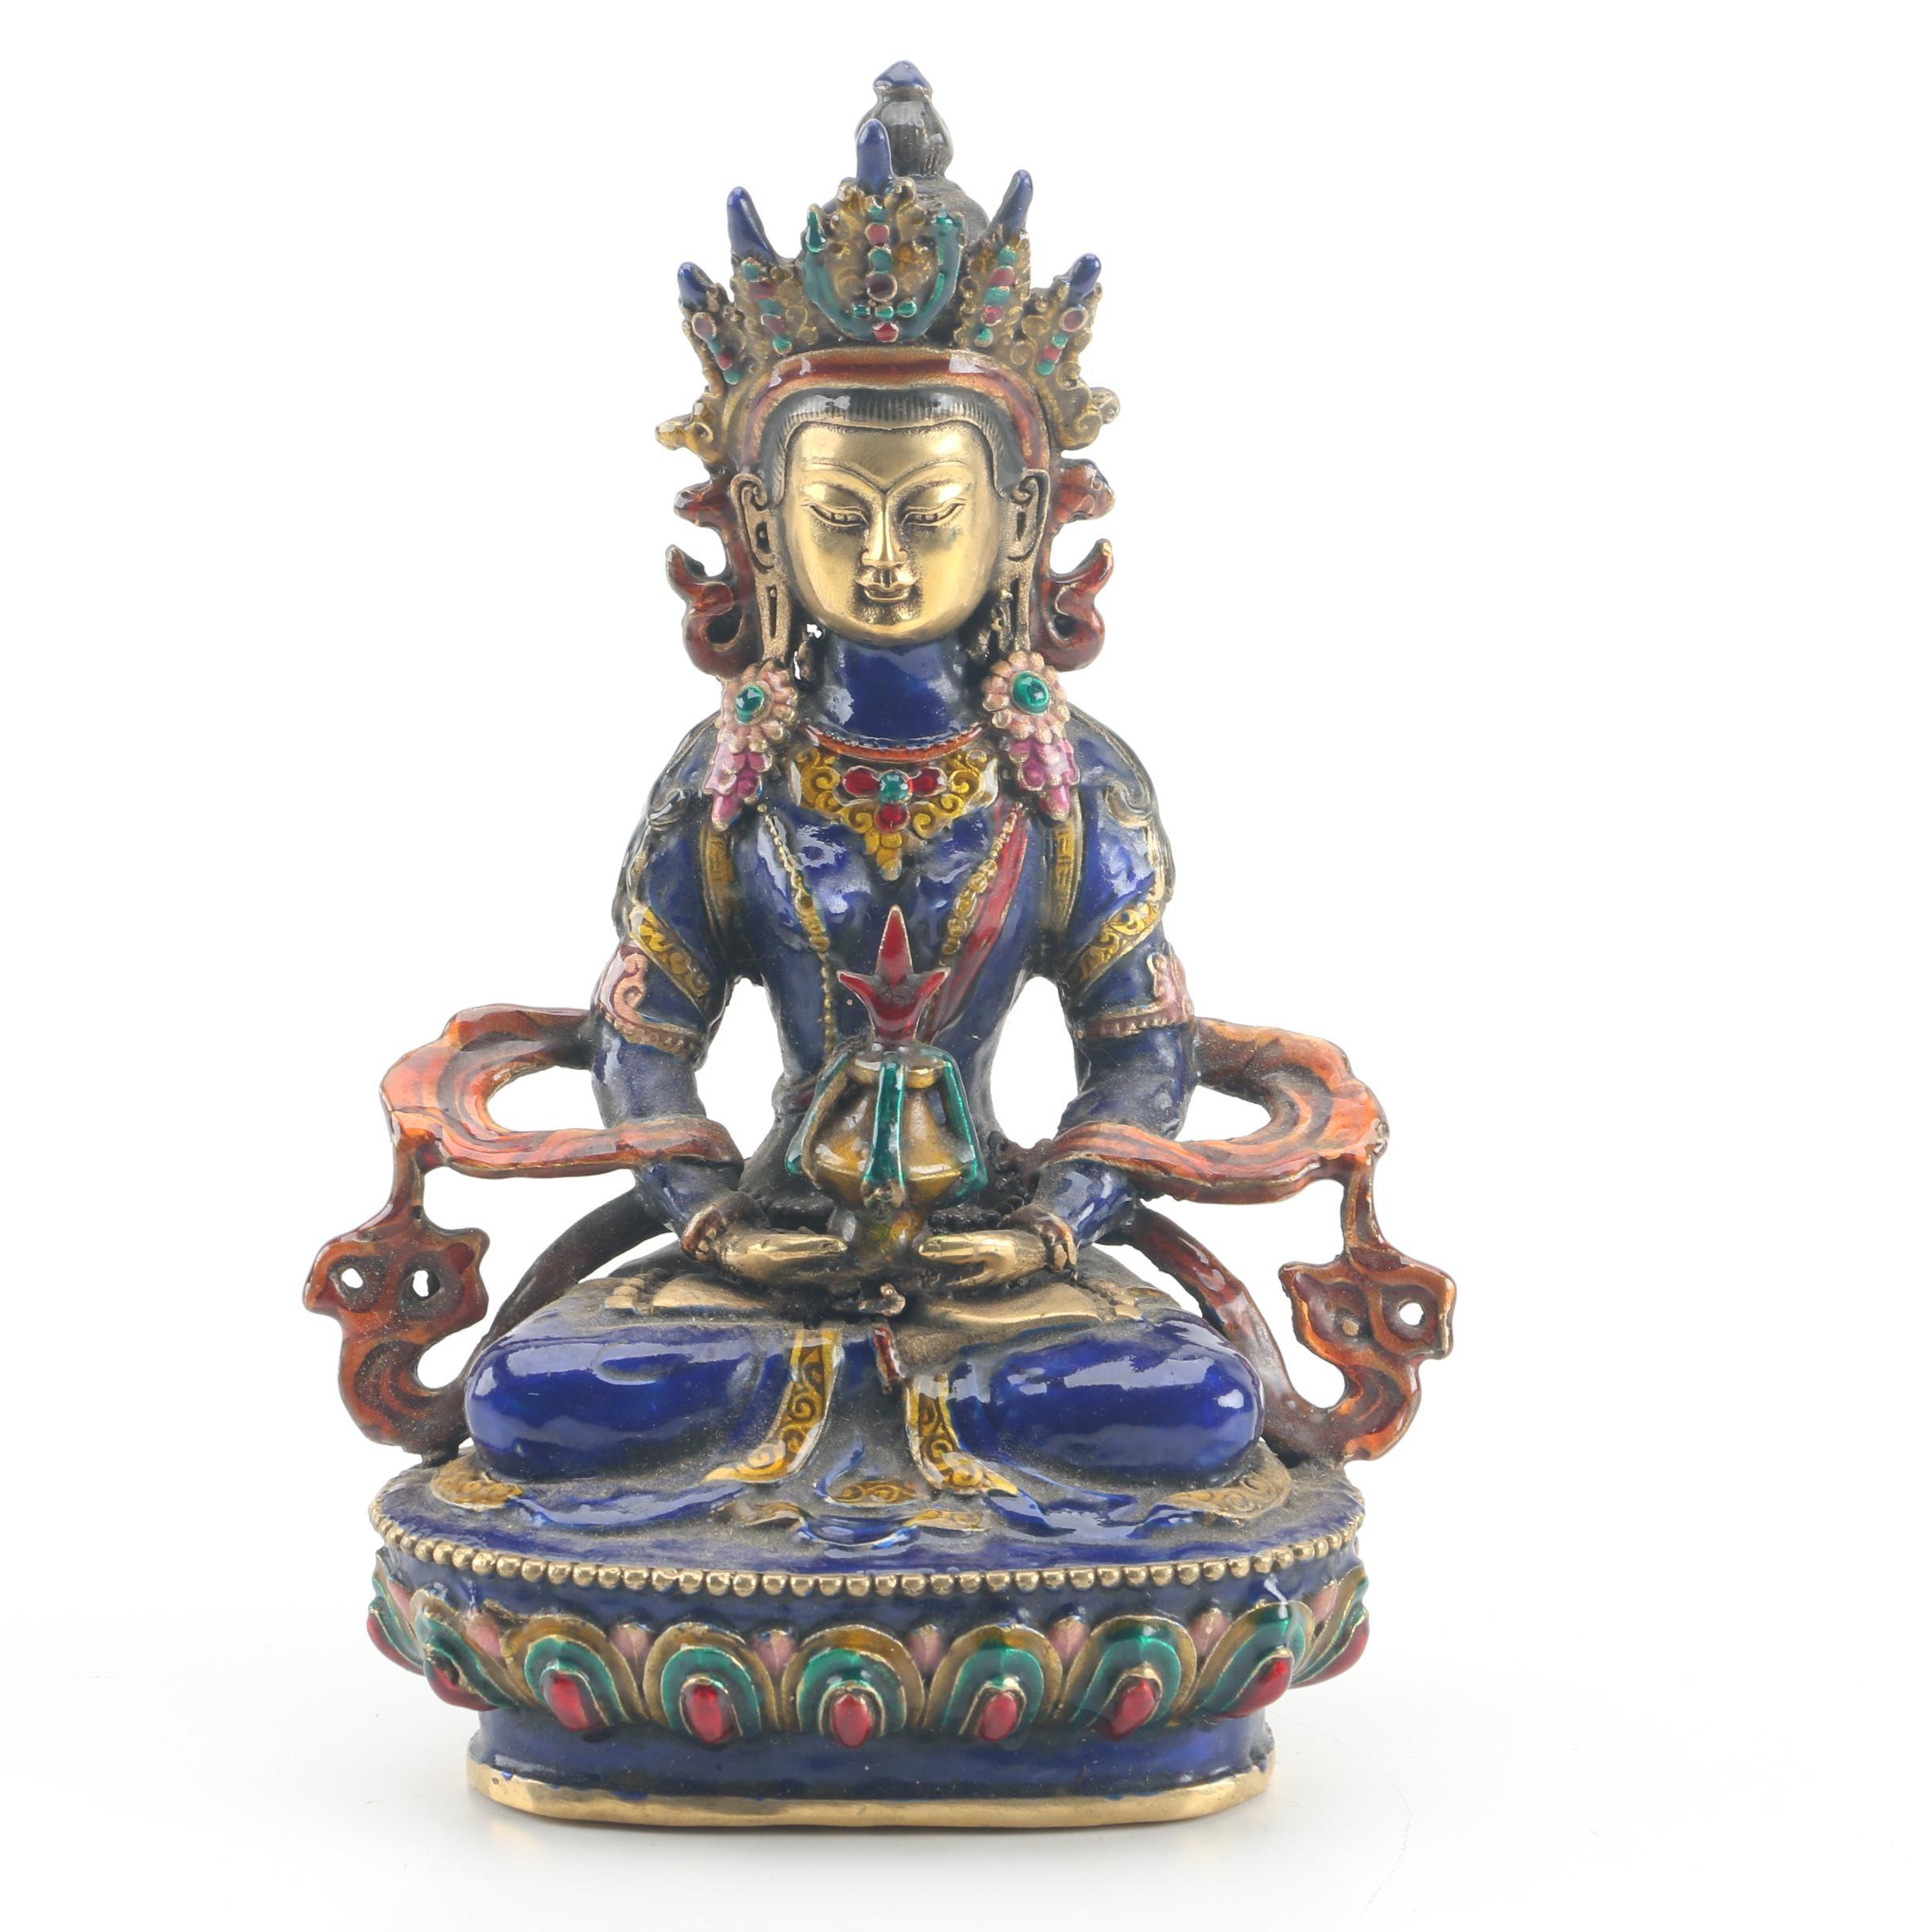 Tibetan Style Enameled Brass Maitreya Bodhisattva Figurine